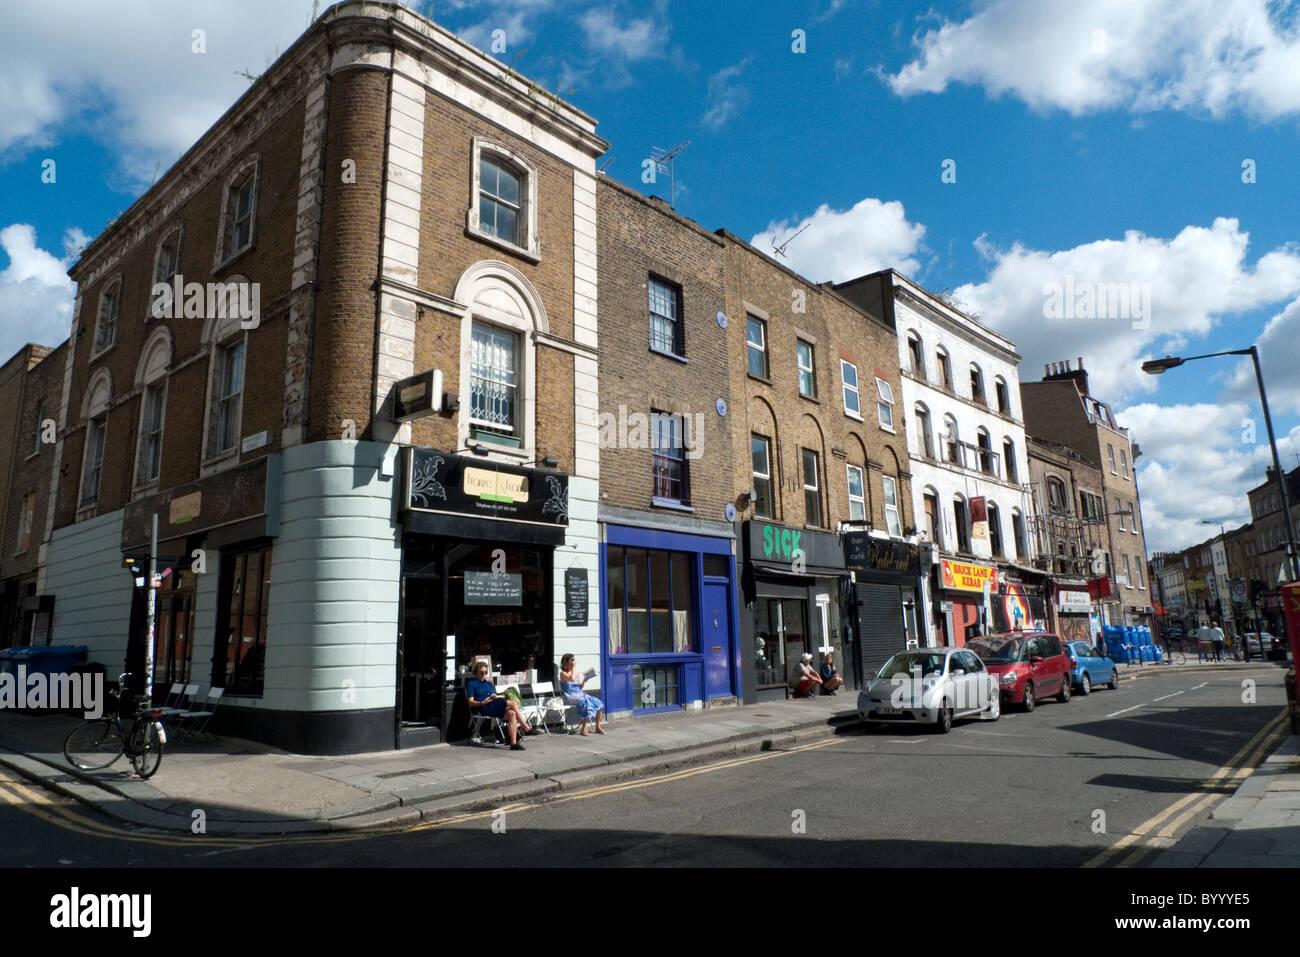 People drinking coffee sitting outside Franze & Evans cafe in Redchurch Street near Brick Lane East End, London Stock Photo